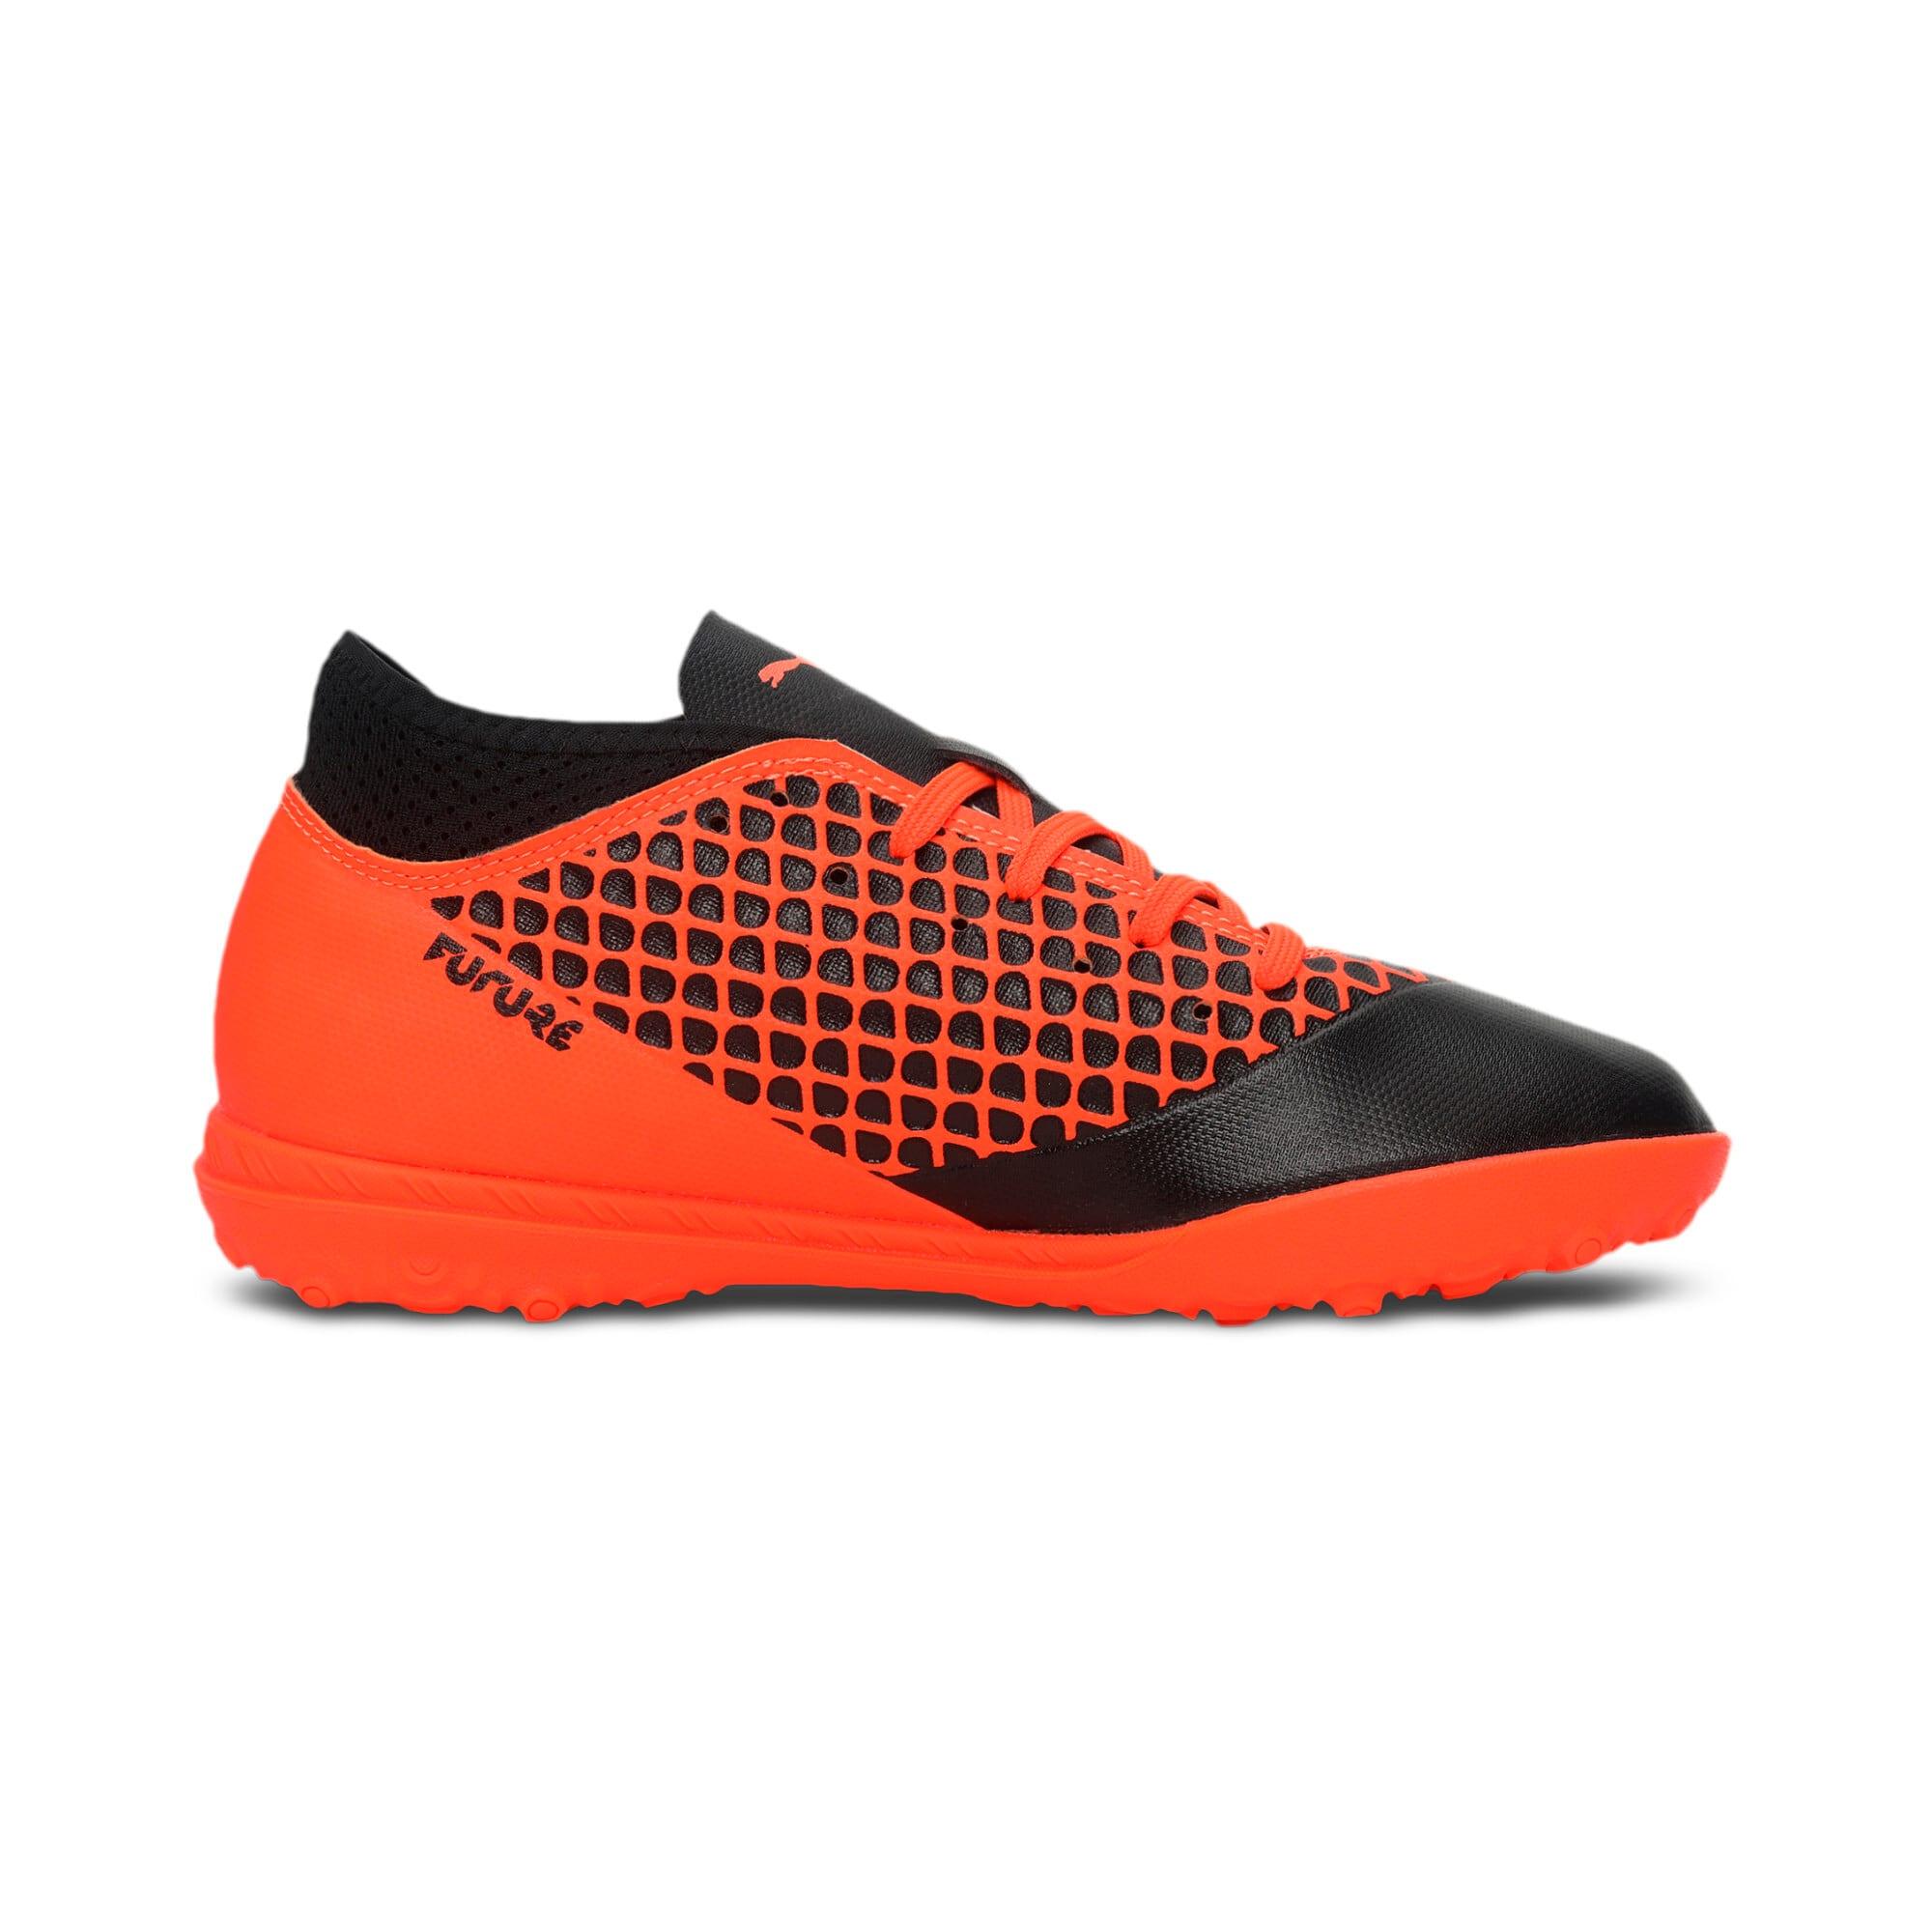 Thumbnail 5 of FUTURE 2.4 TT Kids' Football Boots, Black-Orange, medium-IND